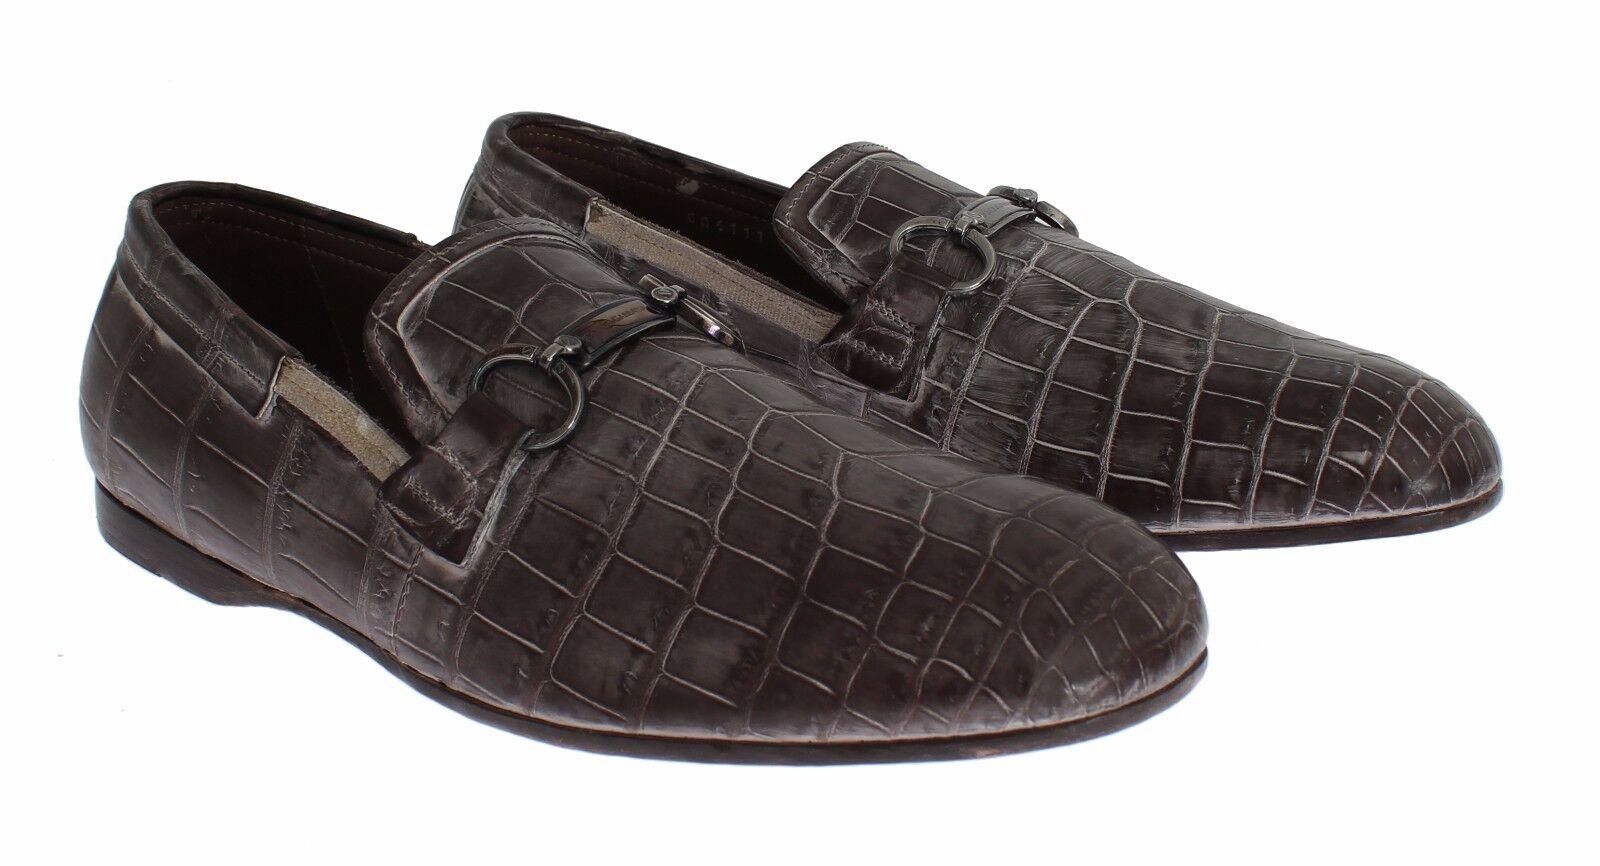 NEW  5400 DOLCE & GABBANA Scarpe Scarpe Scarpe  marrone Crocodile Loafers Dress Formal EU42 / US9 3de3c4